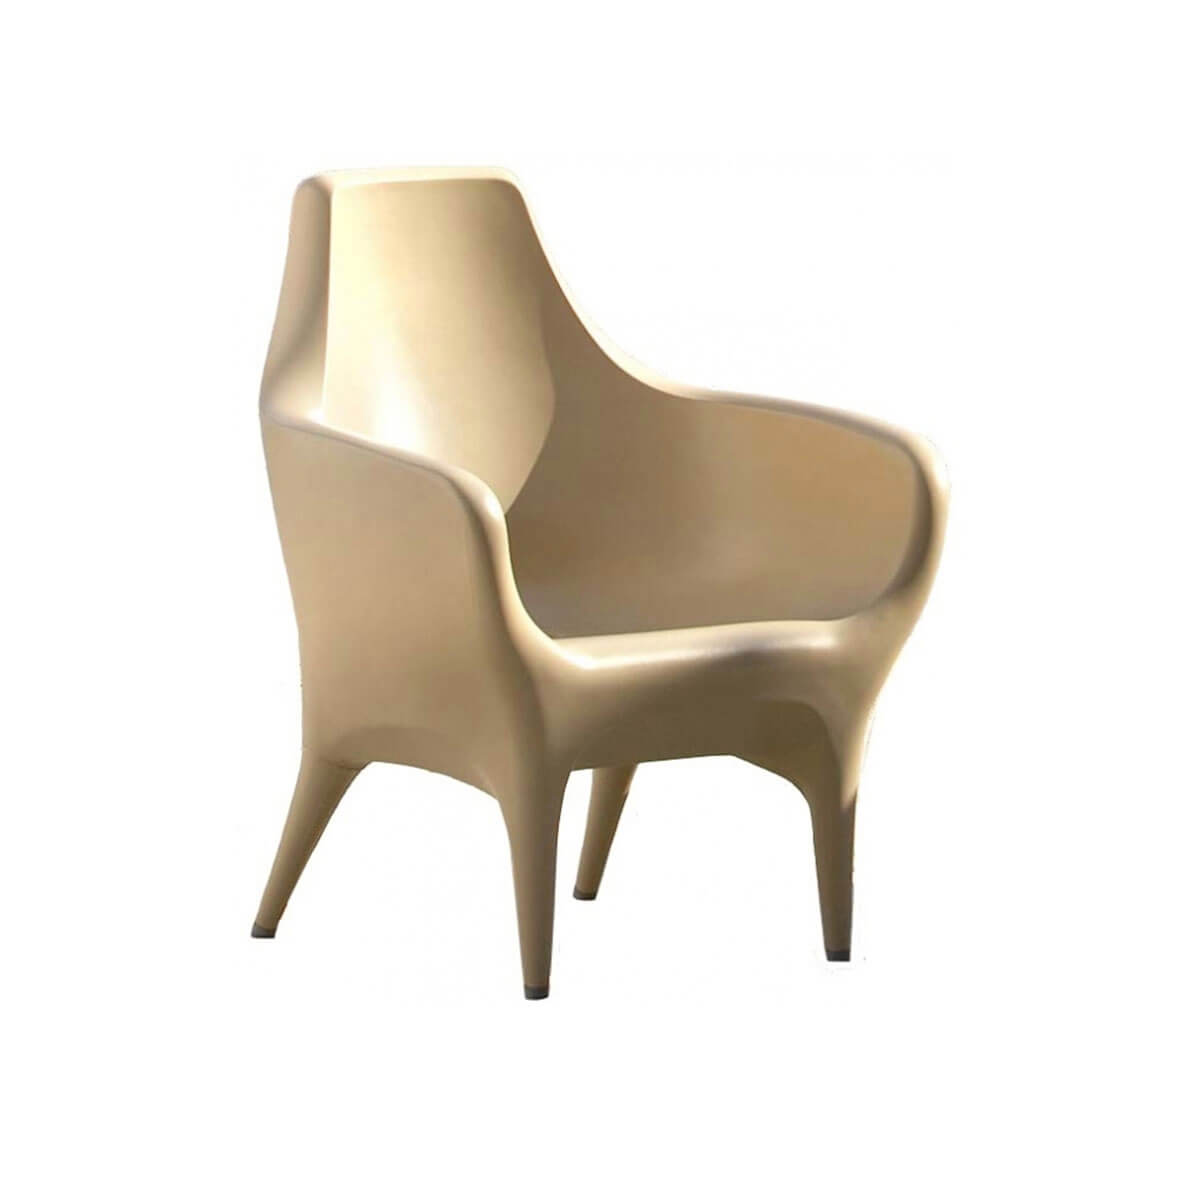 b.d barcelona design  Showtime Armchair - Outdoor 户外扶手椅